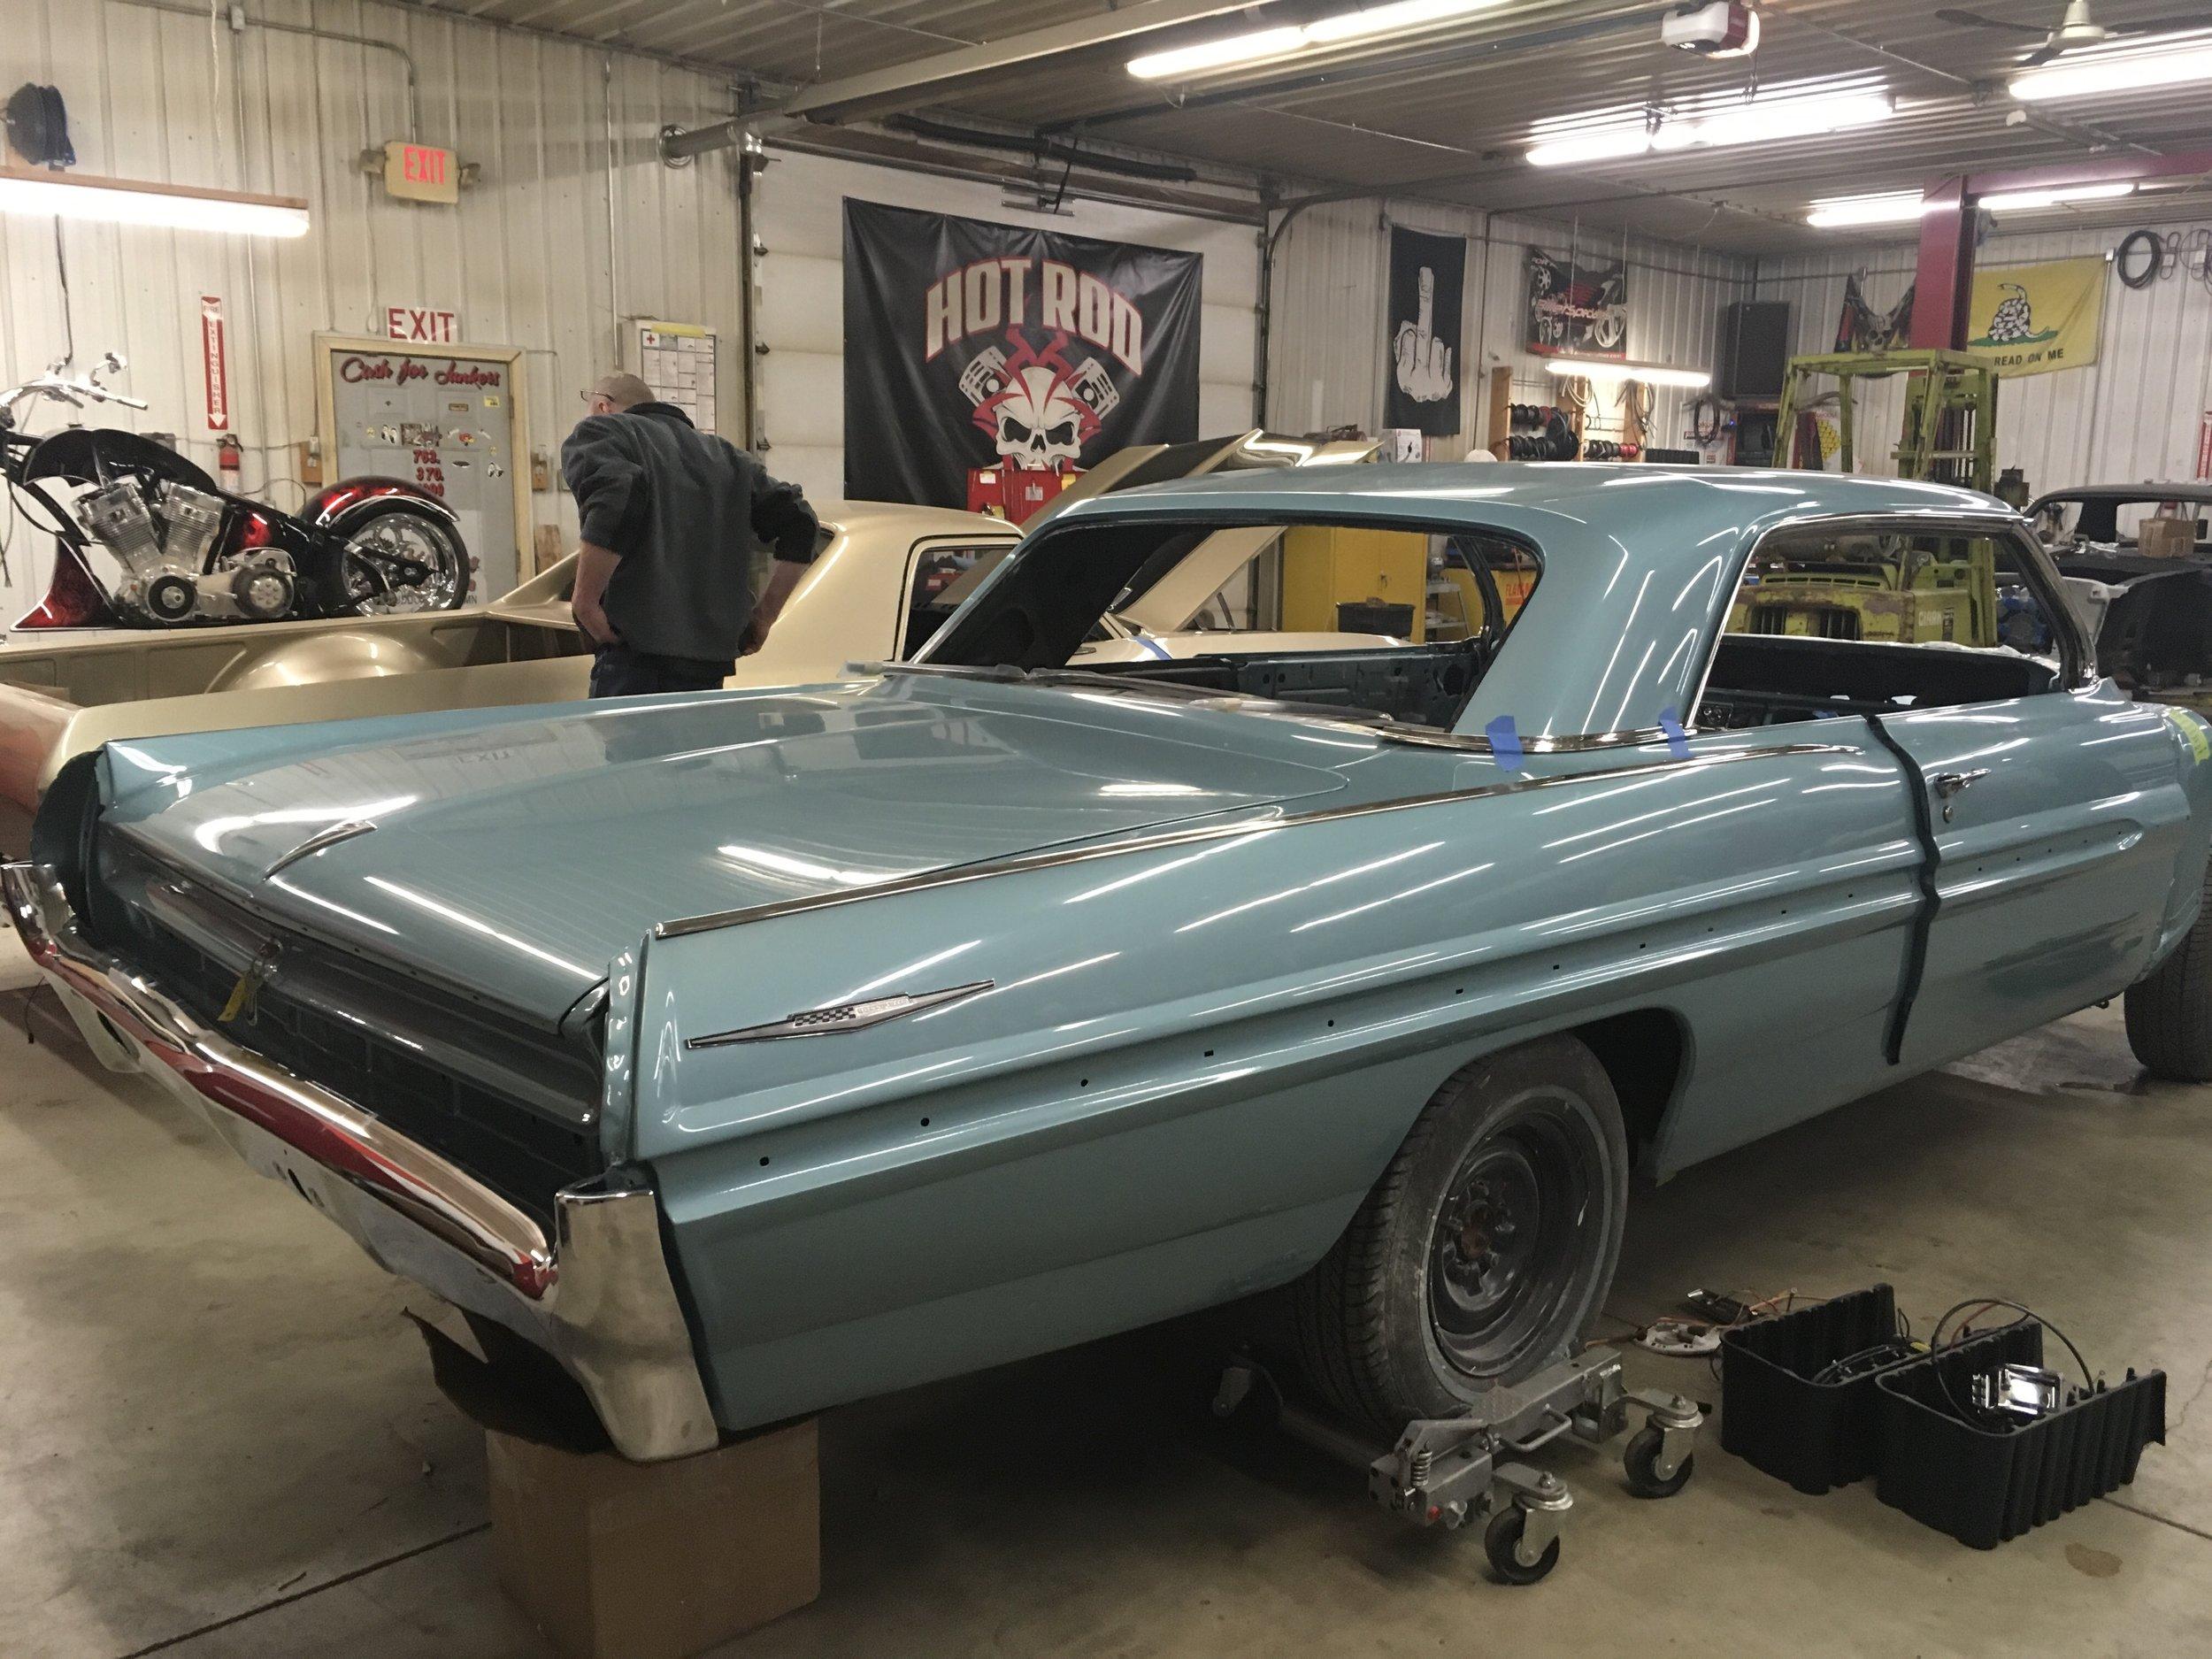 1962-pontiac-bonneville-minneapolis-hot-rod-custom-build-restoration-31.jpg